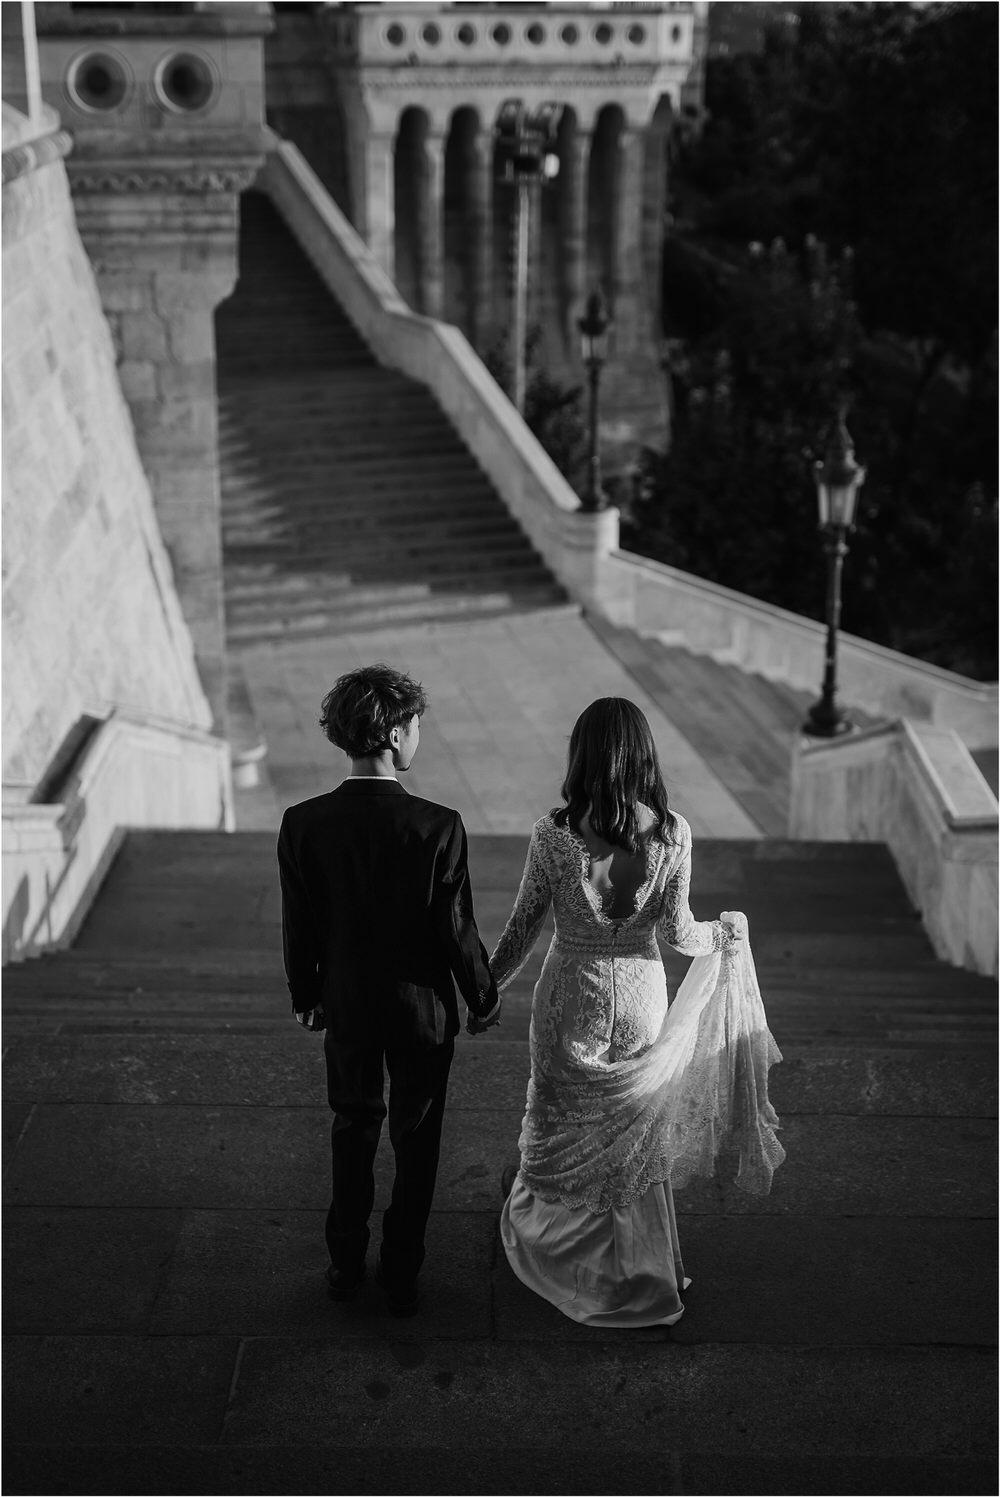 tuscany wedding photographer greece croatia dubrovnik vjencanje hochzeit wedding photography photos romantic engagement nika grega 0130.jpg